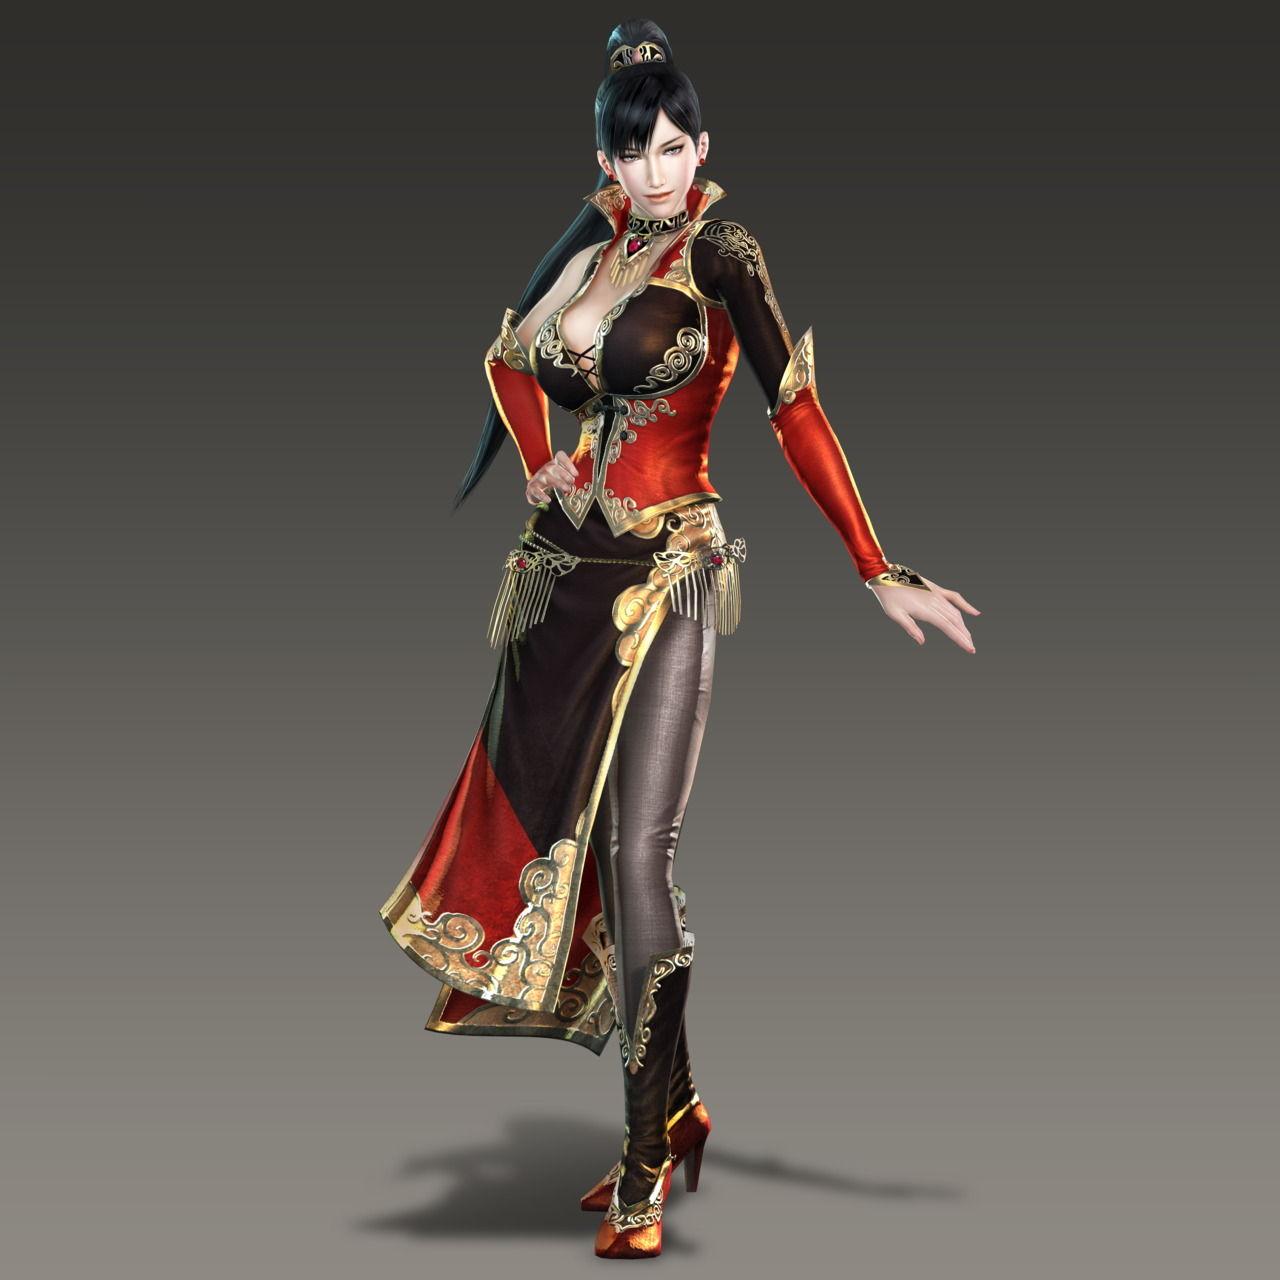 Warriors Orochi 3 Lian Shi: ゲームの画像まとめブログ : 真・三國無双シリーズより練師の画像